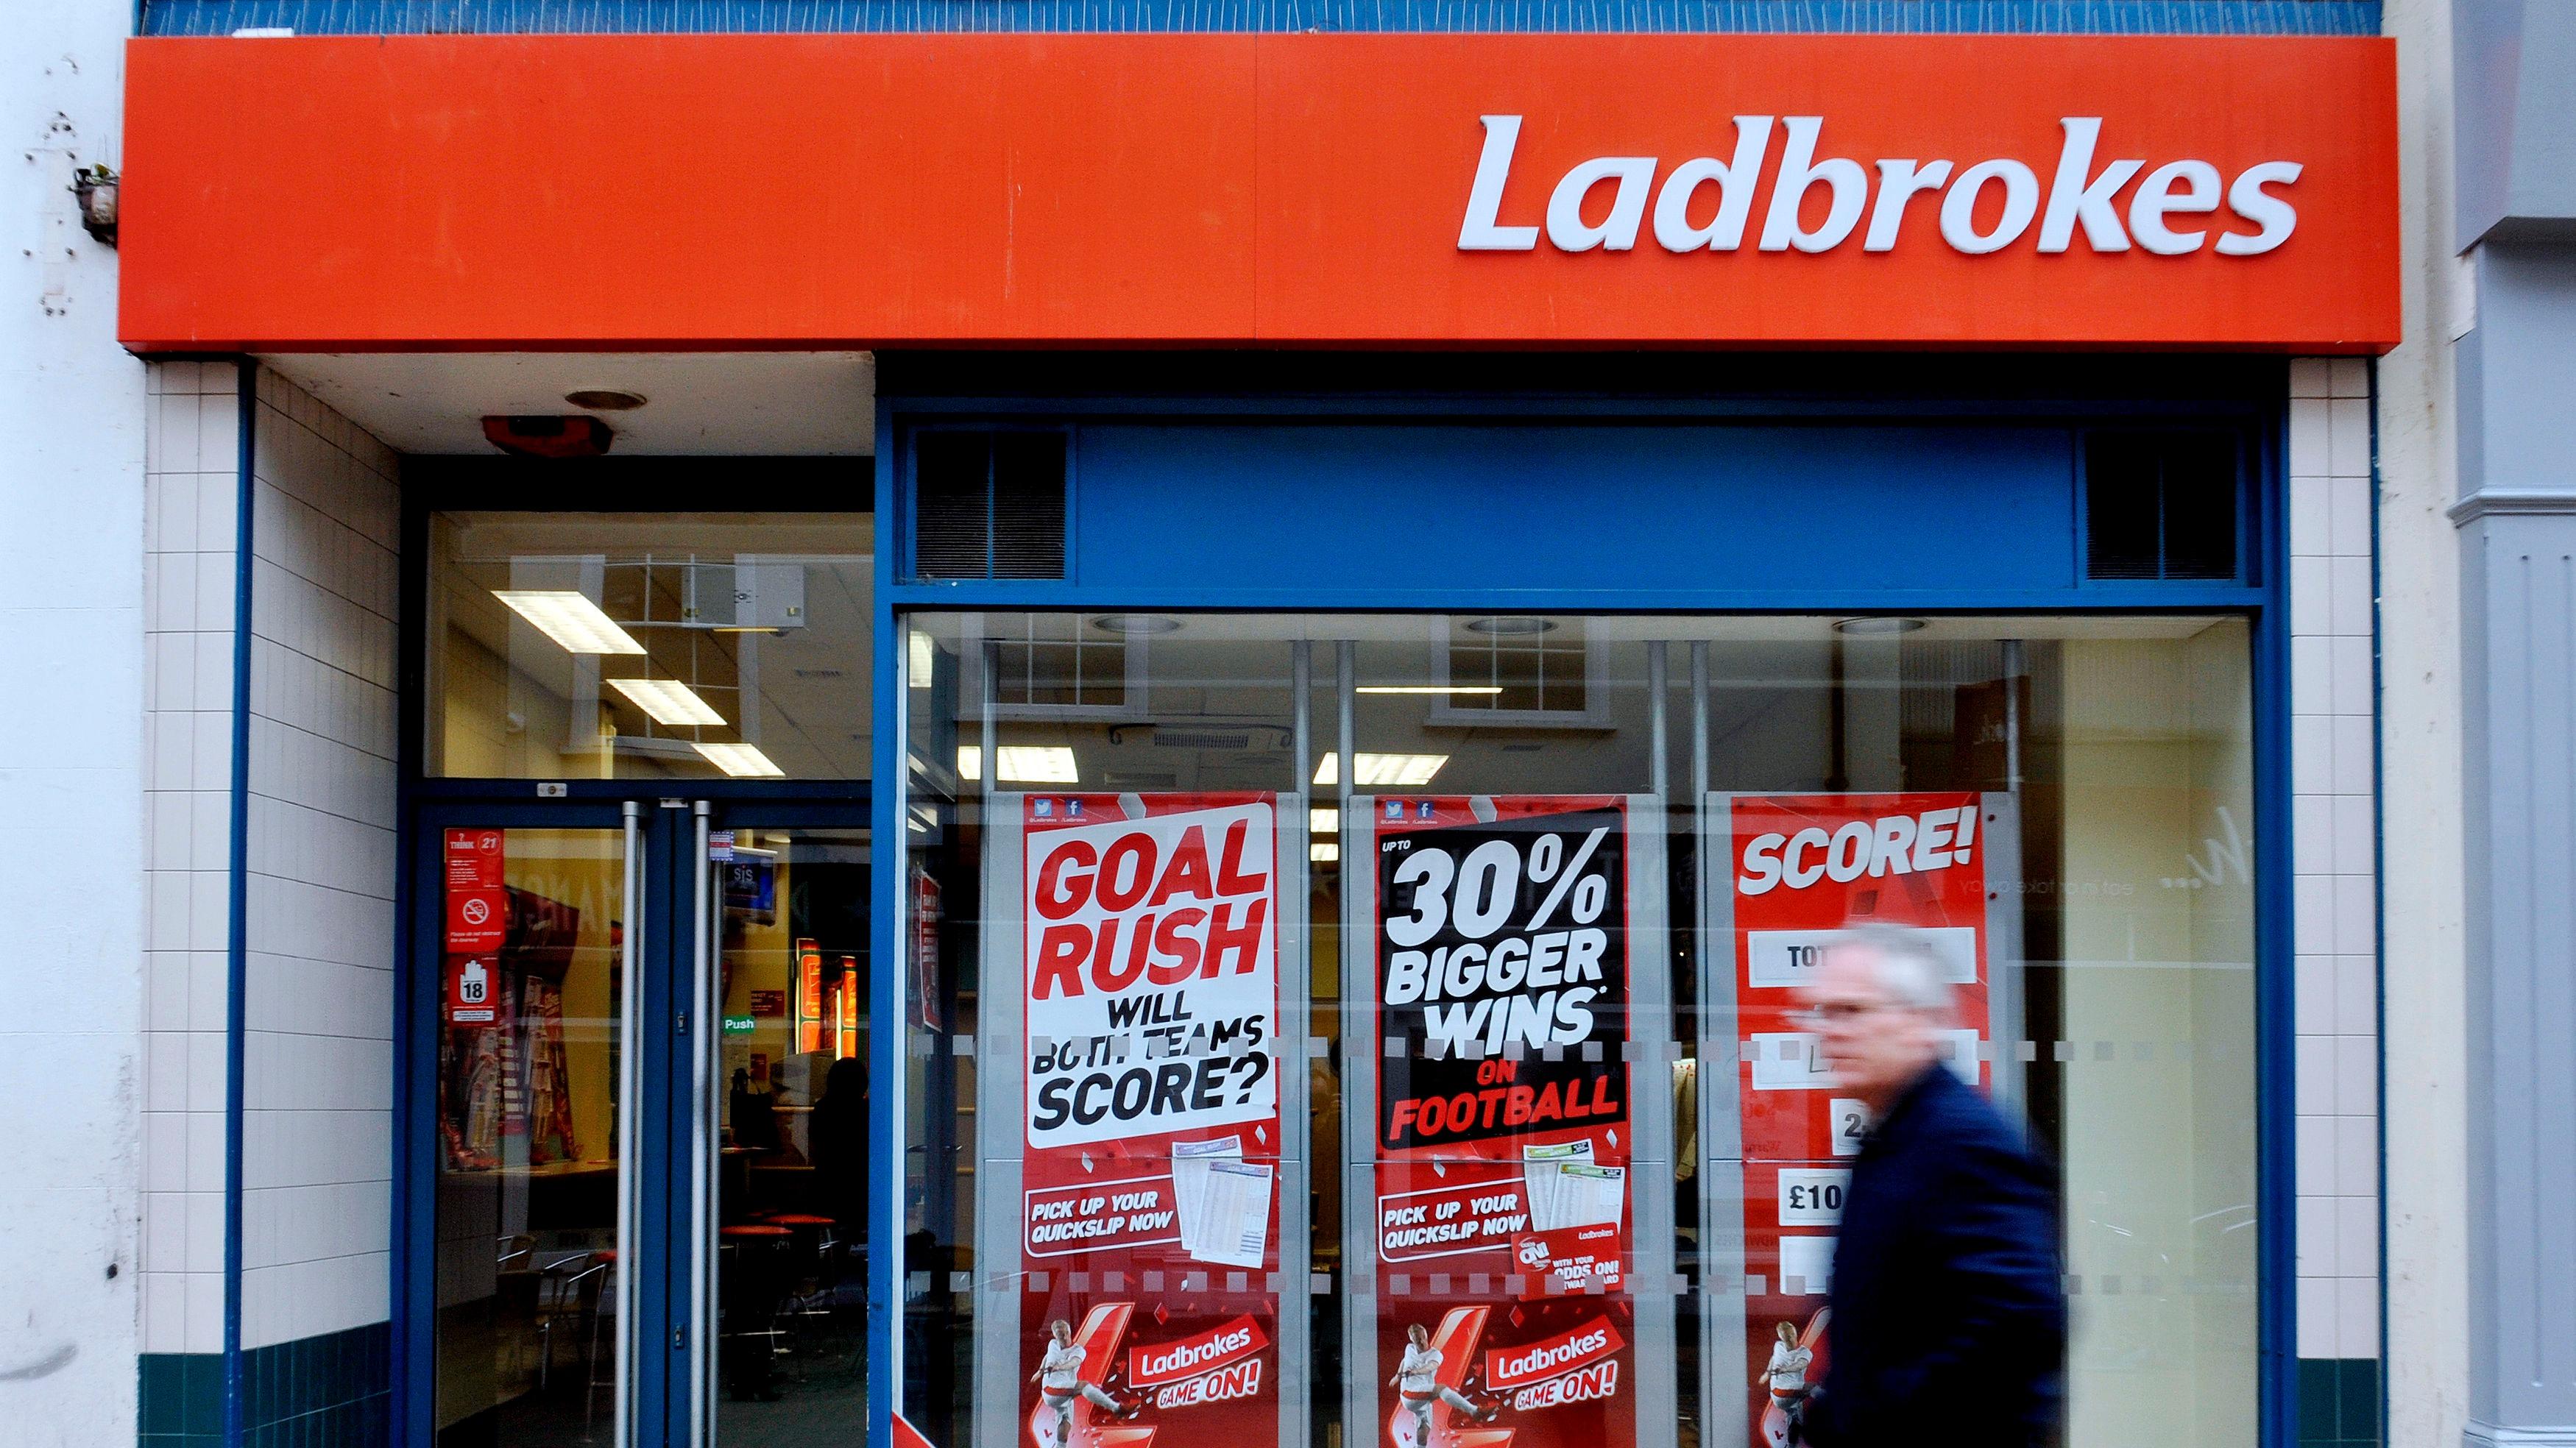 Фотогалерея record breaking election ladbrokes international plc preregister for new global top level  bet win for ladbrokes news stv - Яхтинг на Камчатке